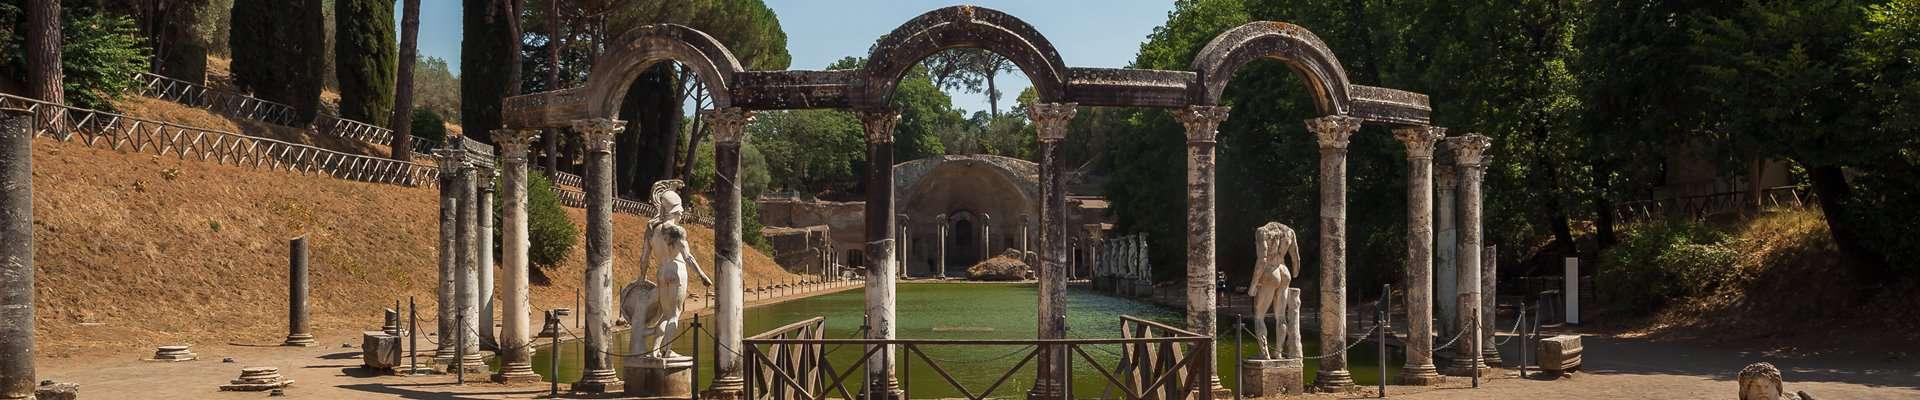 Canal at Hadrian's Villa that imitates the sanctuary of Serapis in Alexandria.